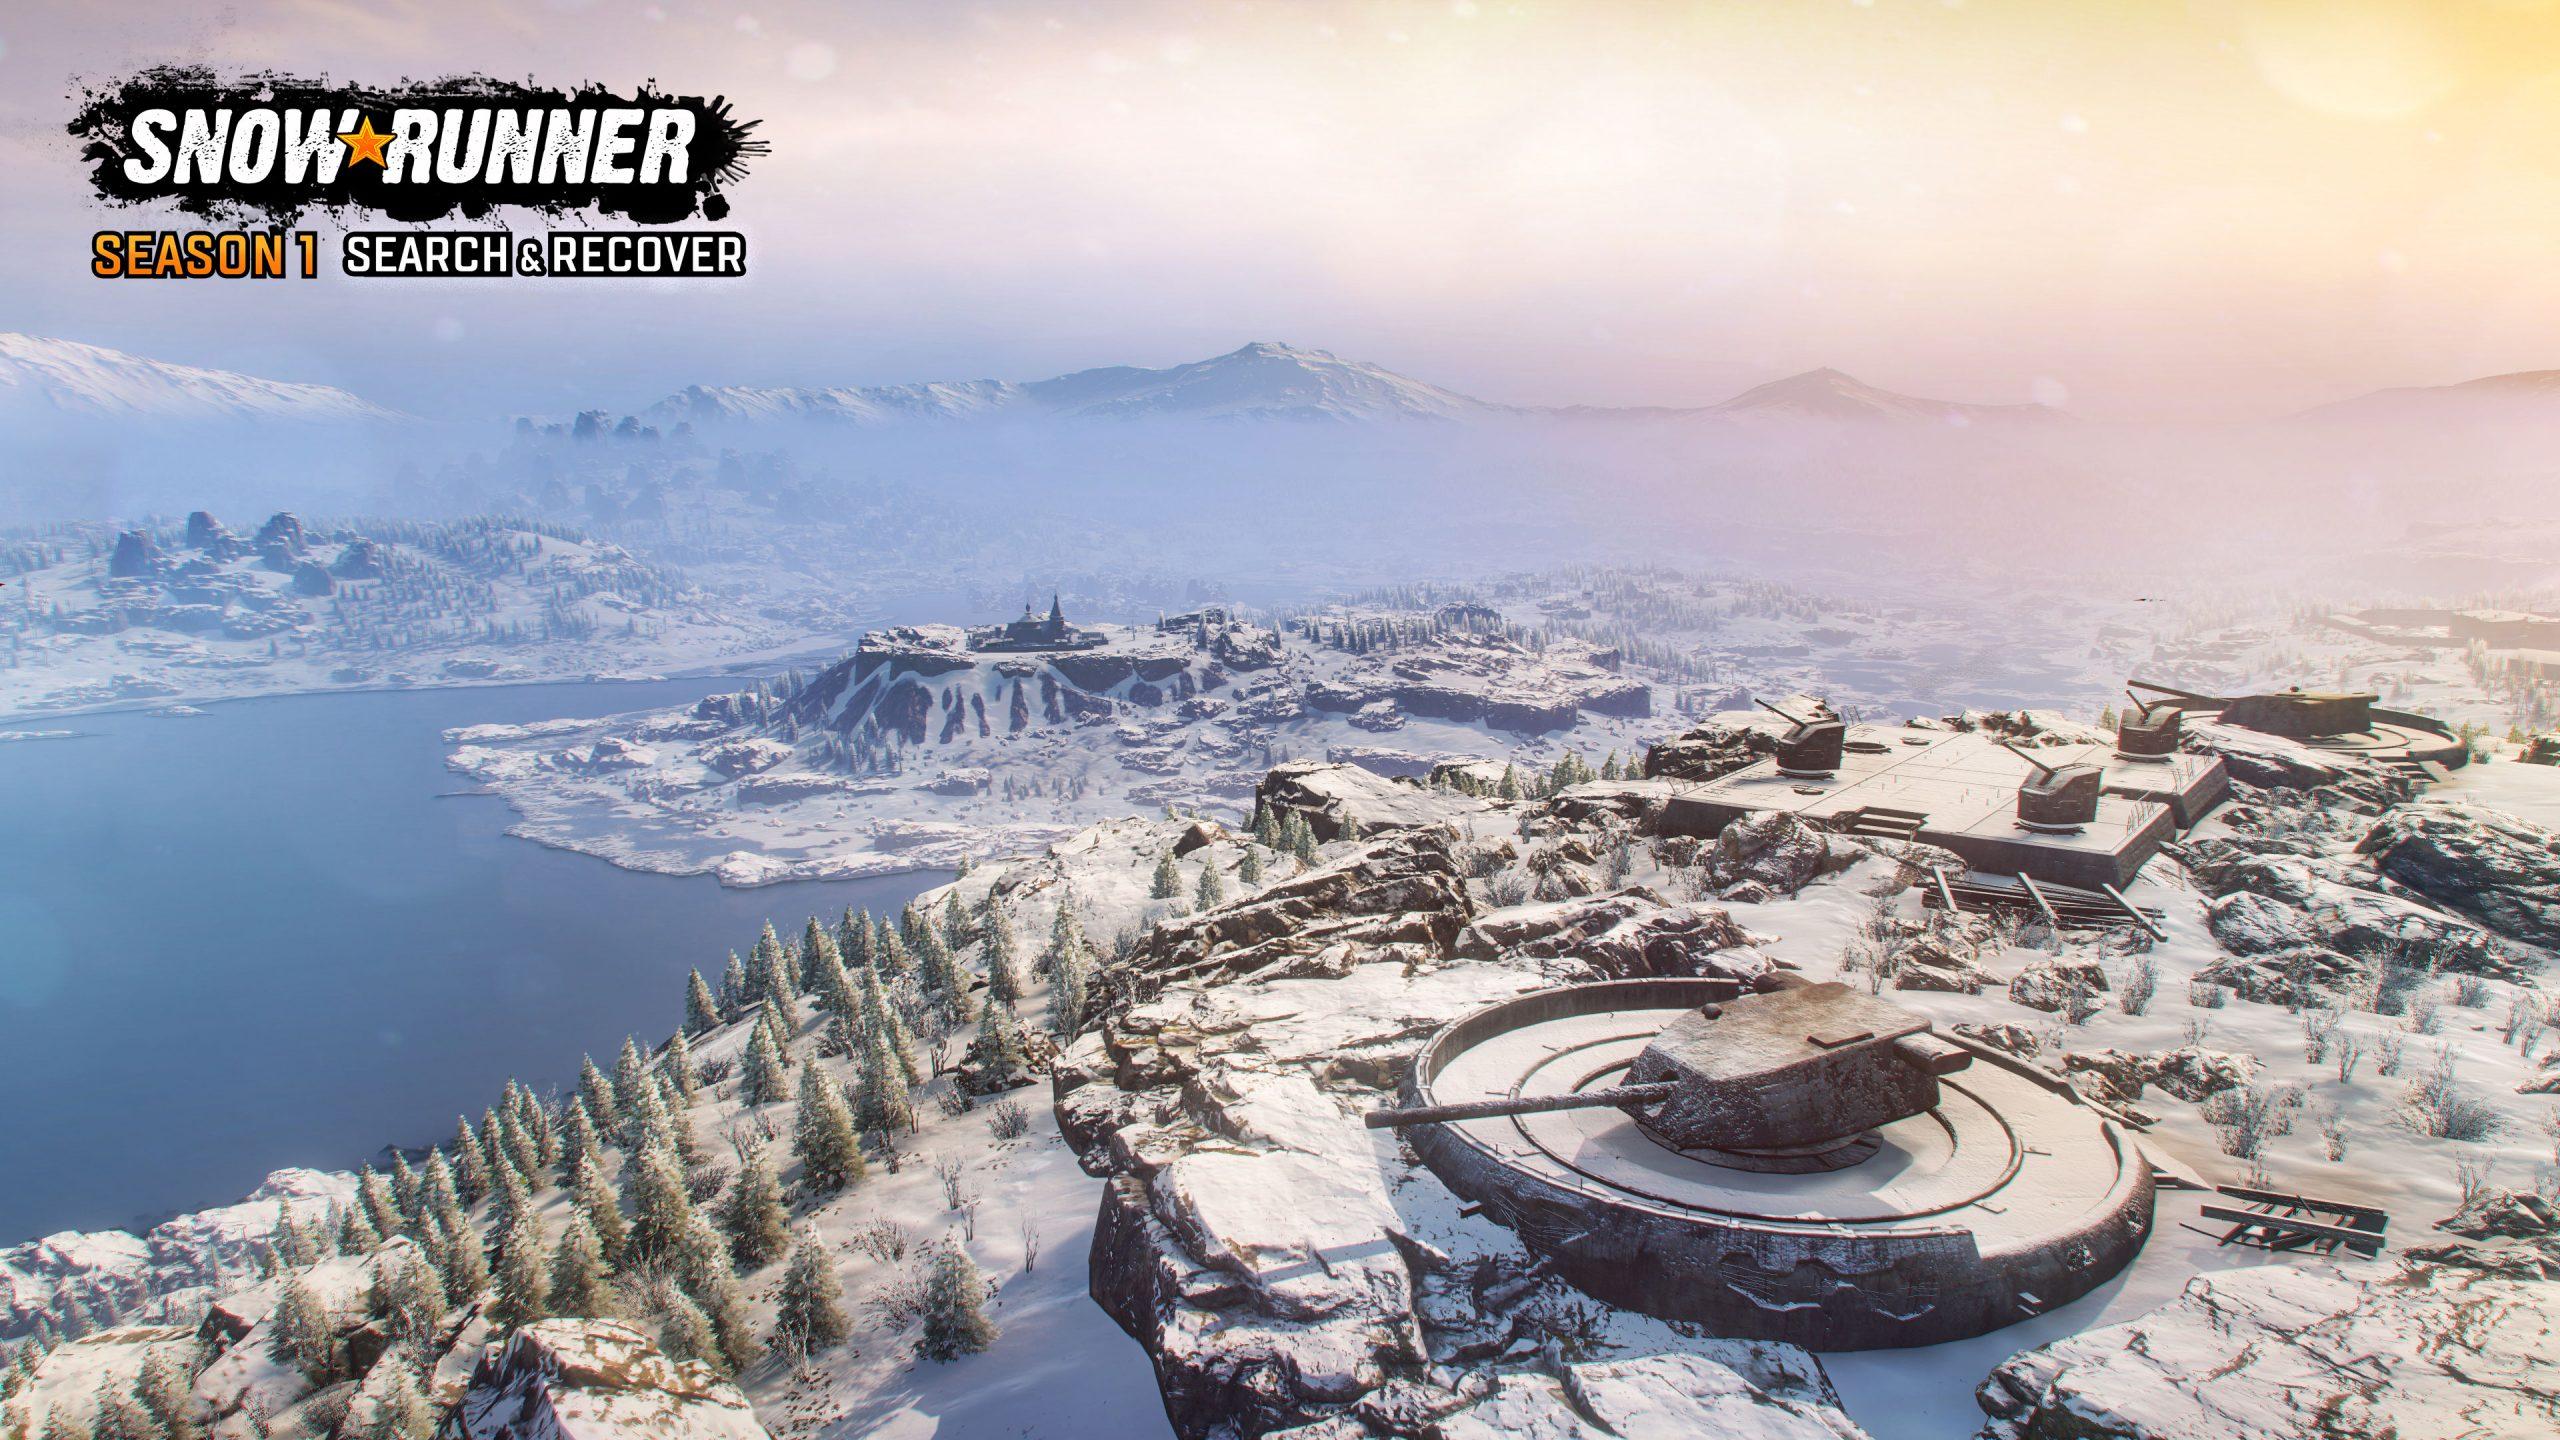 SnowRunner Season1 screenshot logo 06 scaled - SnowRunner Gets Its First Big DLC Next Week